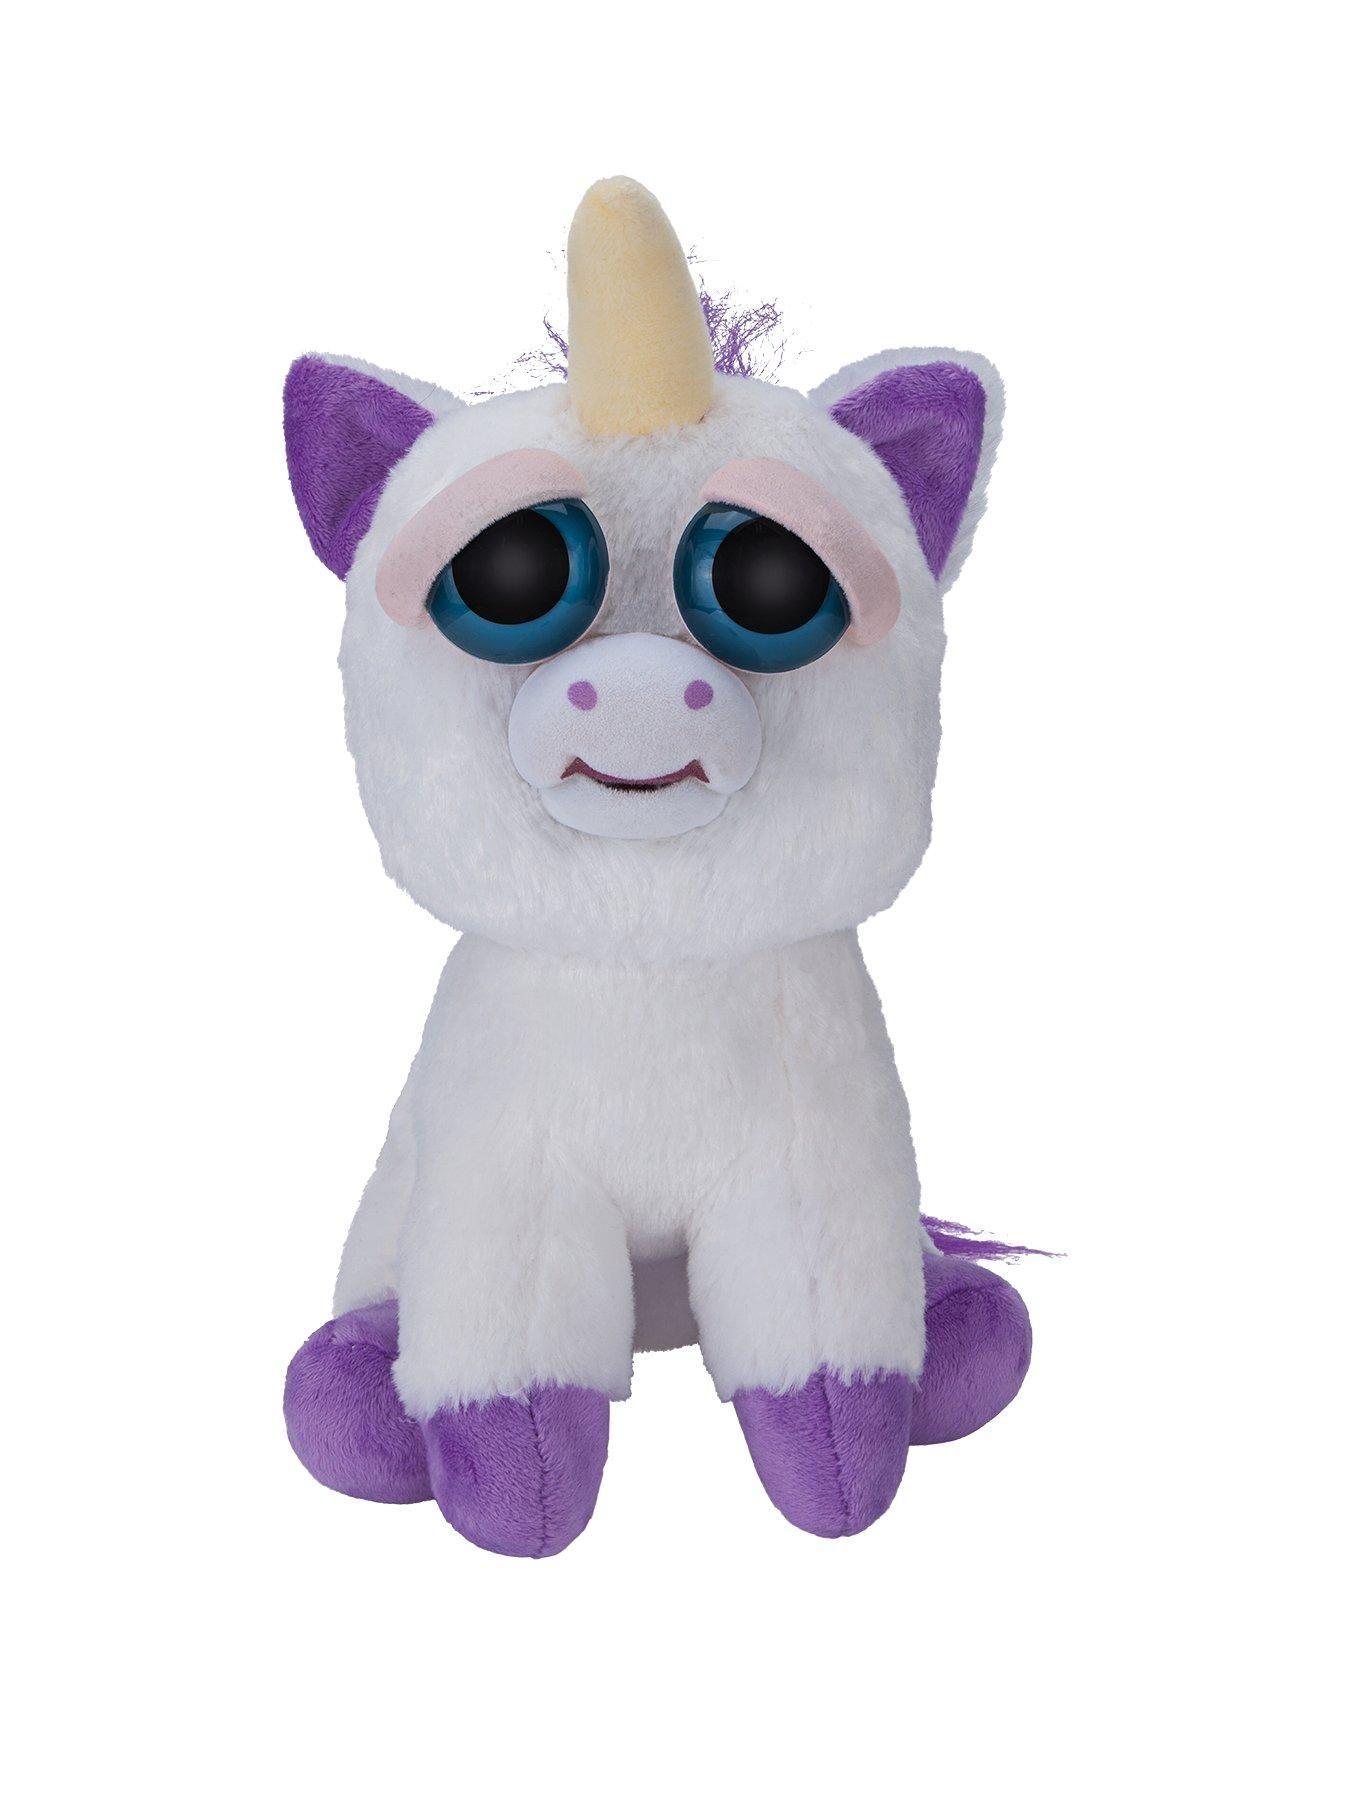 Feisty Pets Feisty Pets Feature Plush Glenda Glitterpoop Unicorn